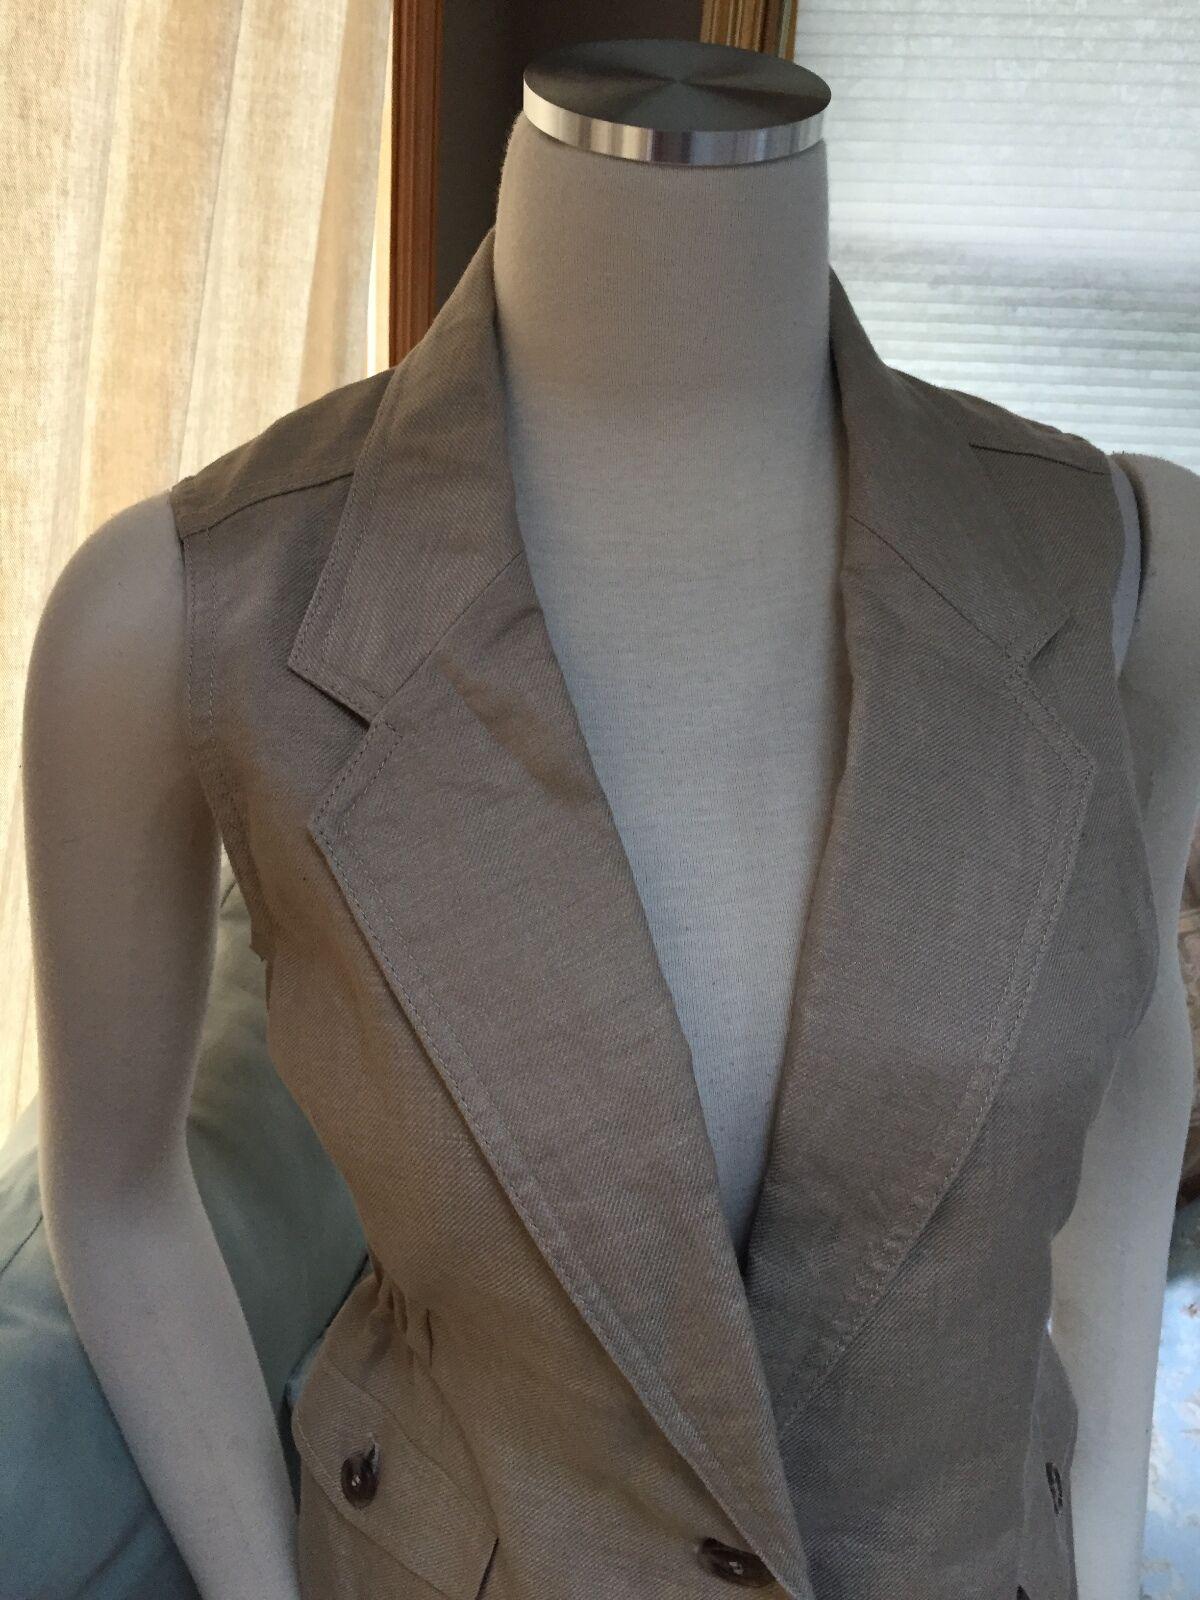 NWOT NWOT NWOT The Limited Safari Natural Tan Khaki 100% Linen Vest Small 414681